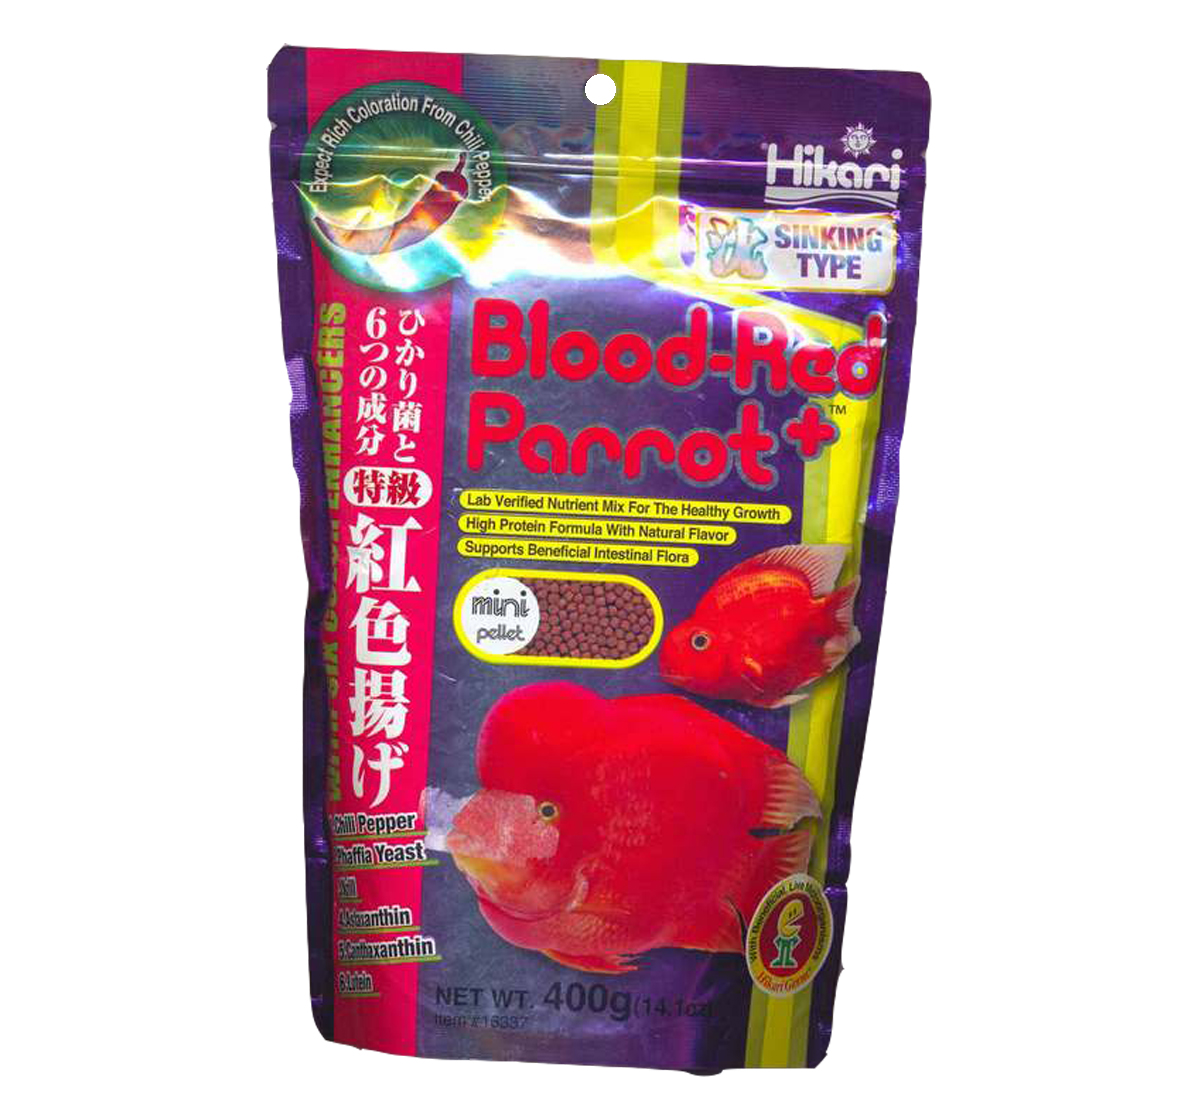 Hikari Blood Red Parrot Plus Sinking Fish Food - 400 Gm | DogSpot ...